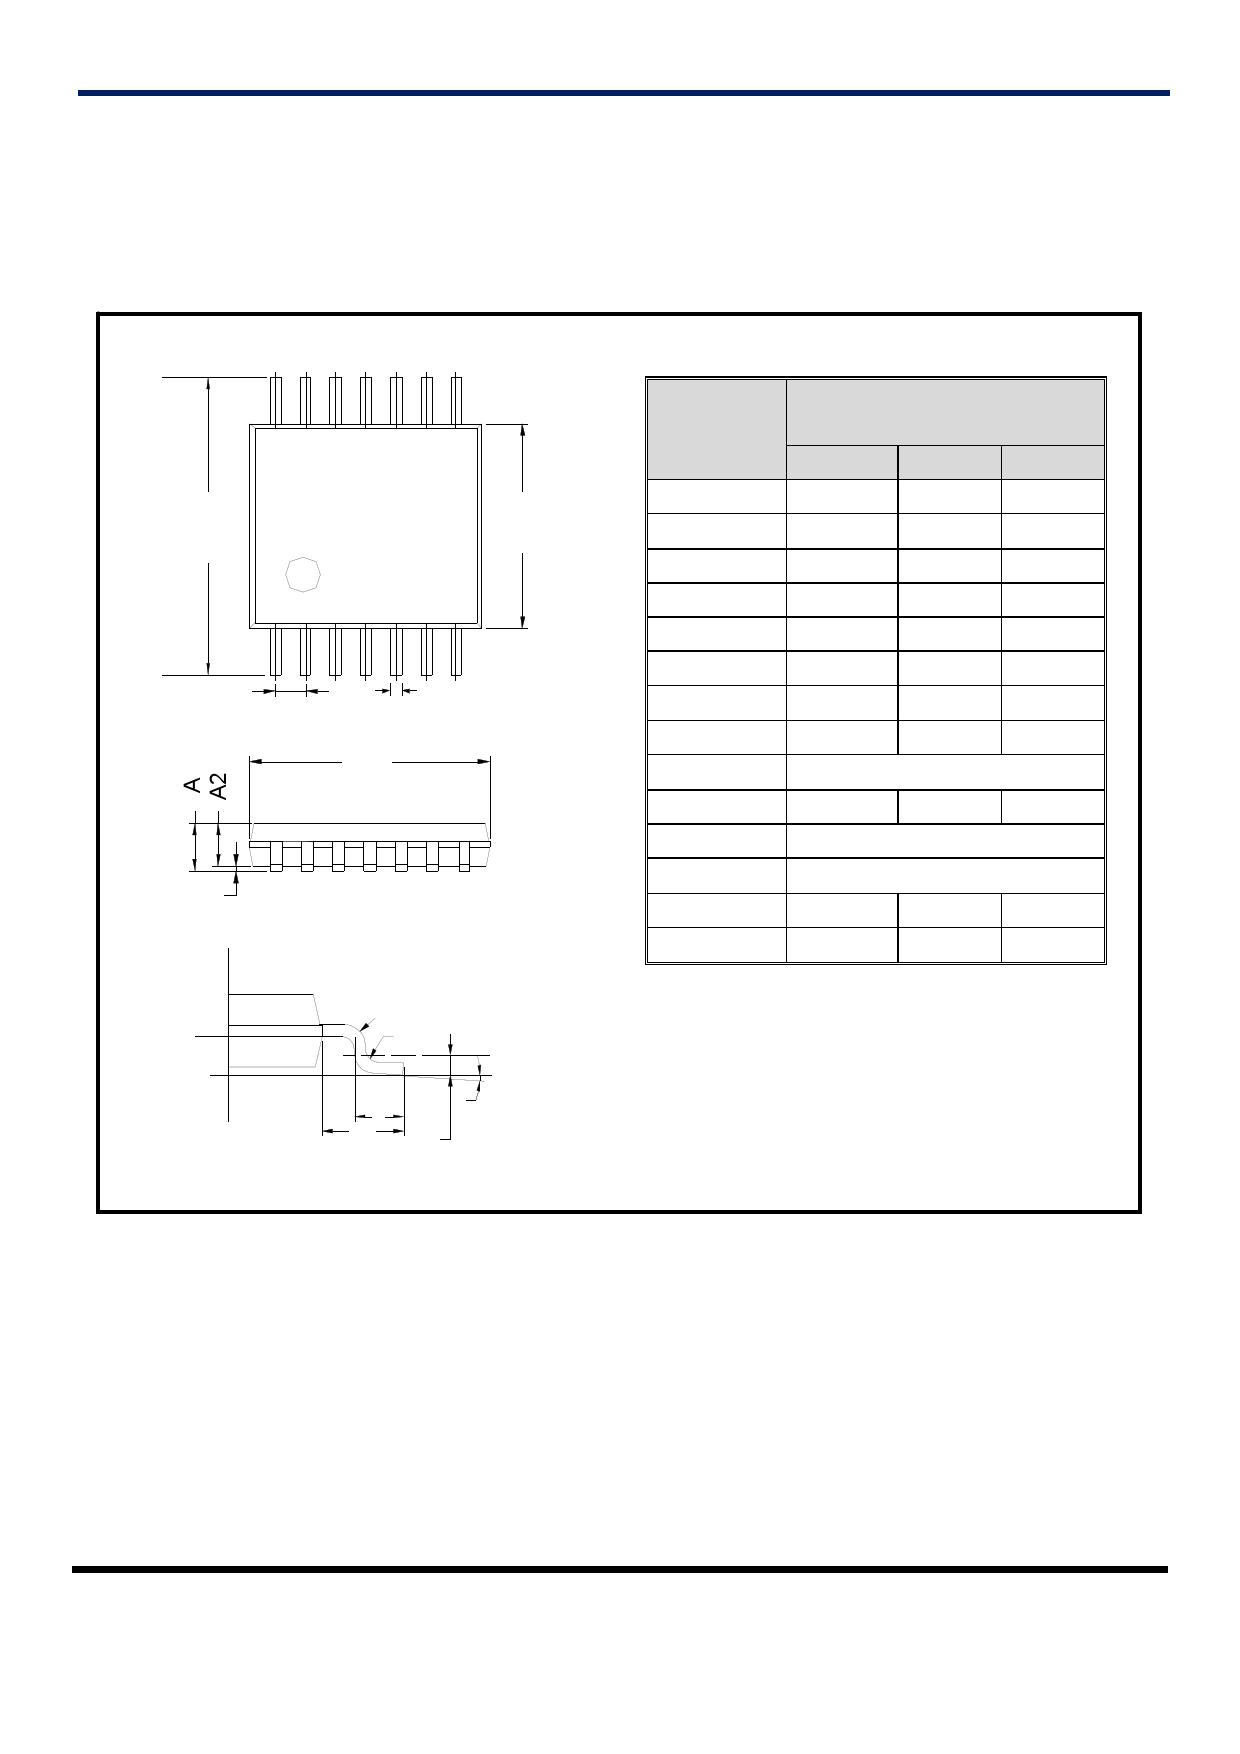 TPF603 arduino